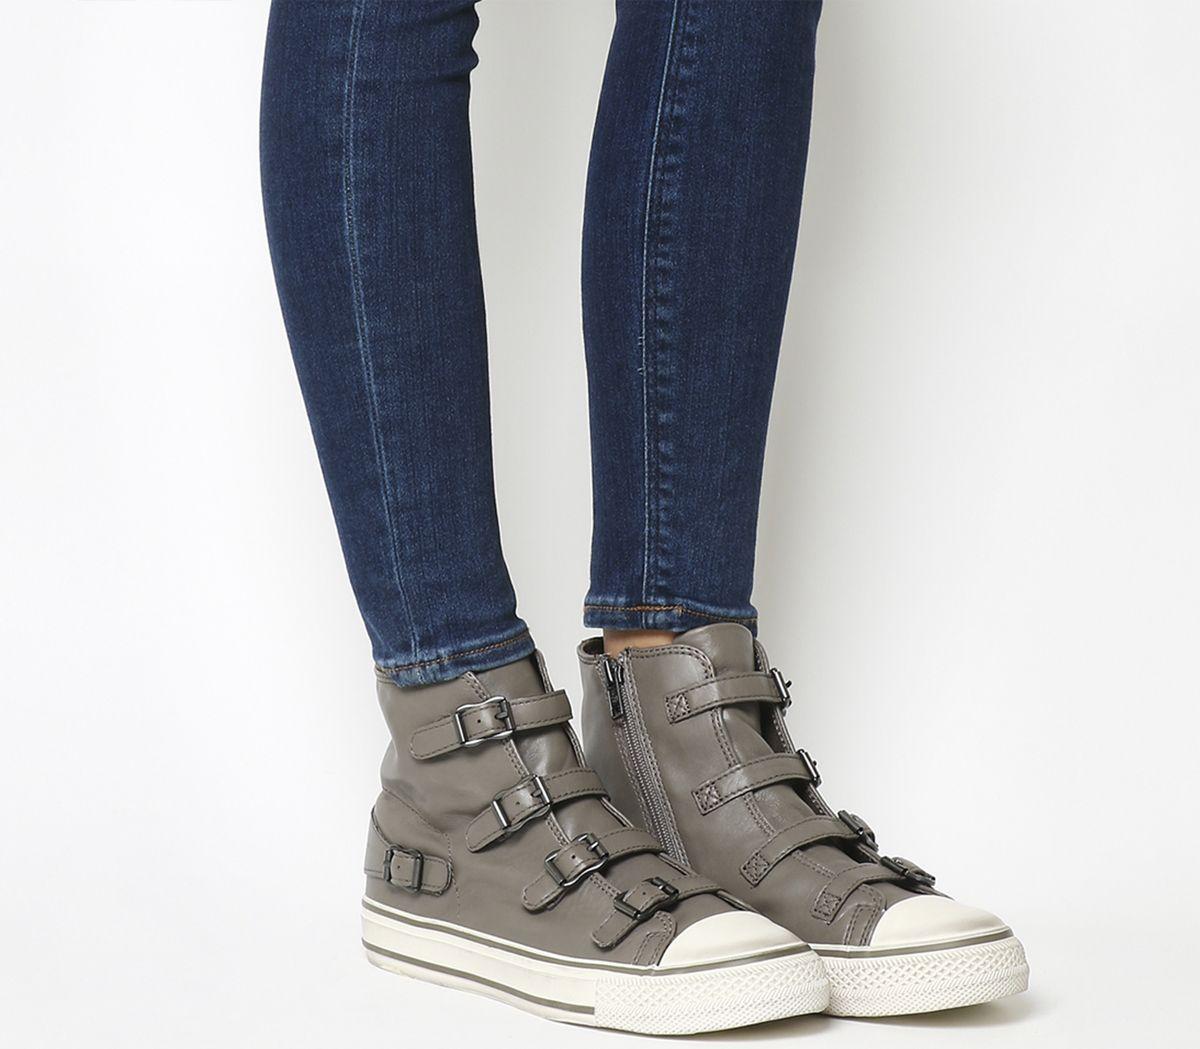 204b520af9 Ash Virgin High Top Perkish Nappa Wax - Ankle Boots